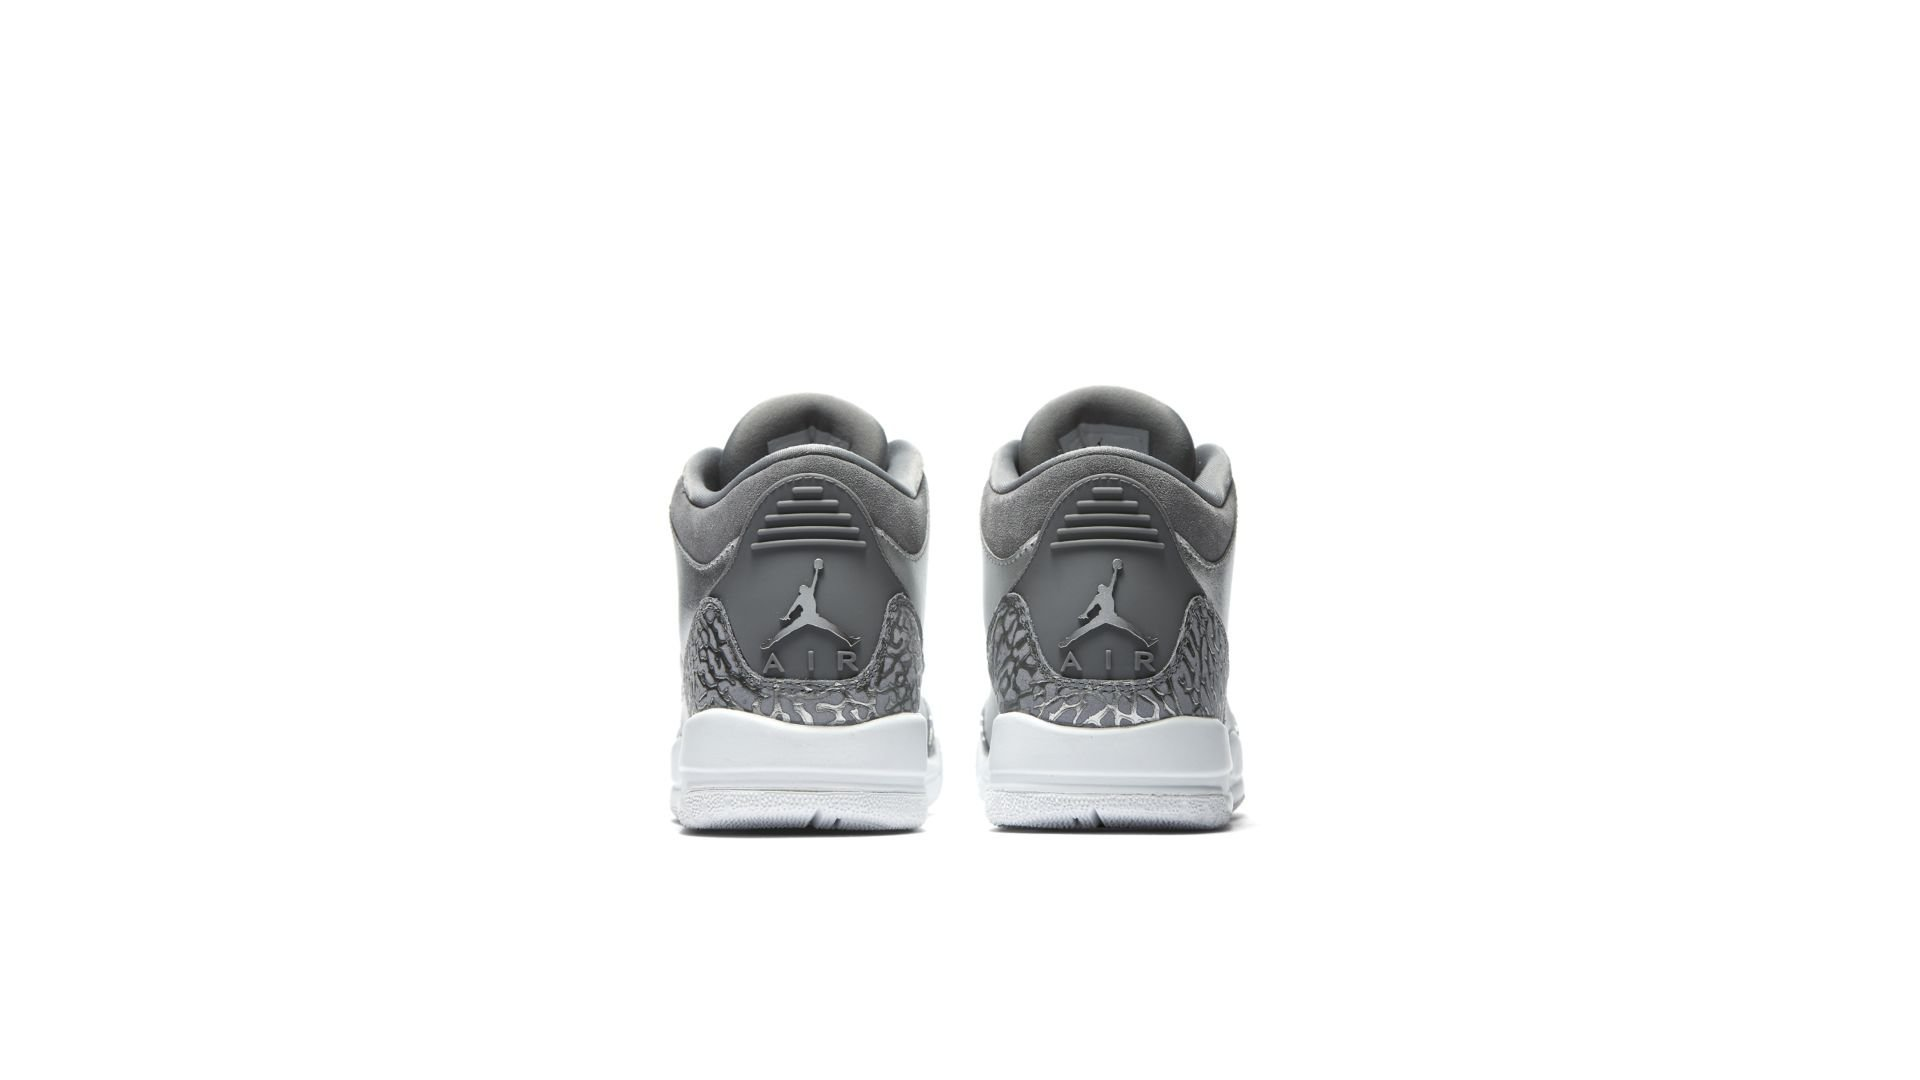 Jordan 3 Retro Premium Heiress Metallic Silver (GS) (AA1243-020)